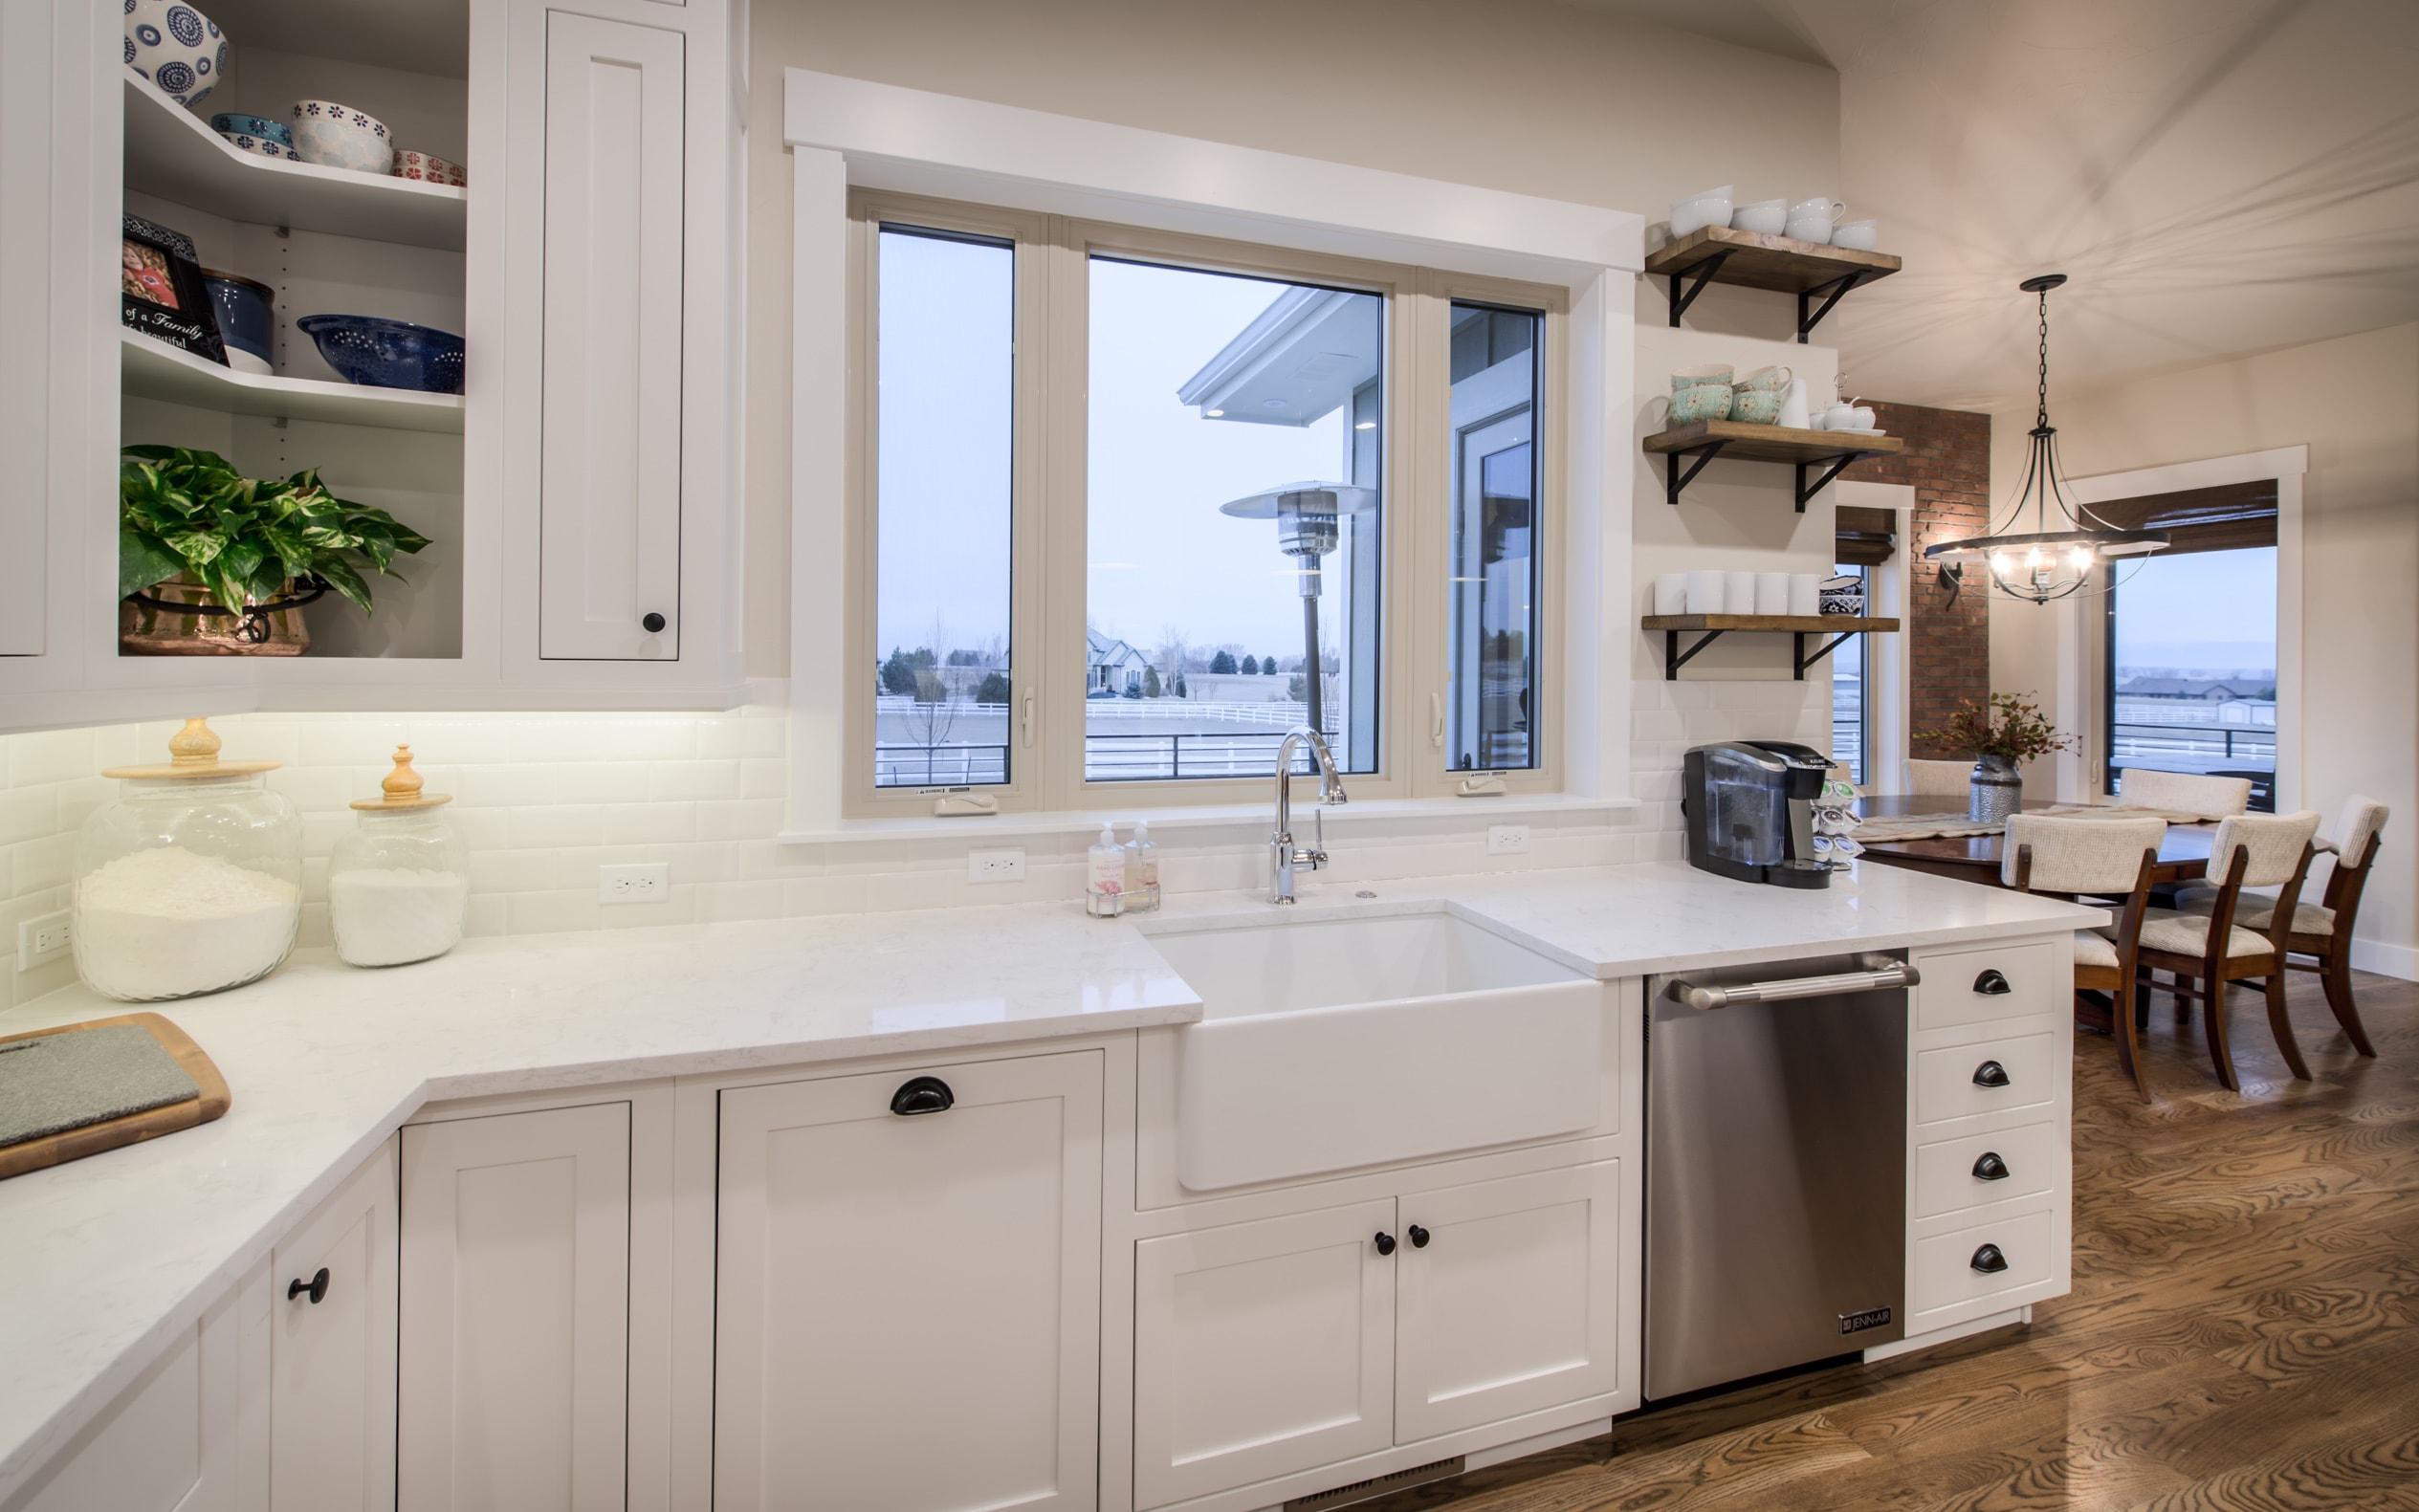 All-white kitchen in House Plan #161-1072